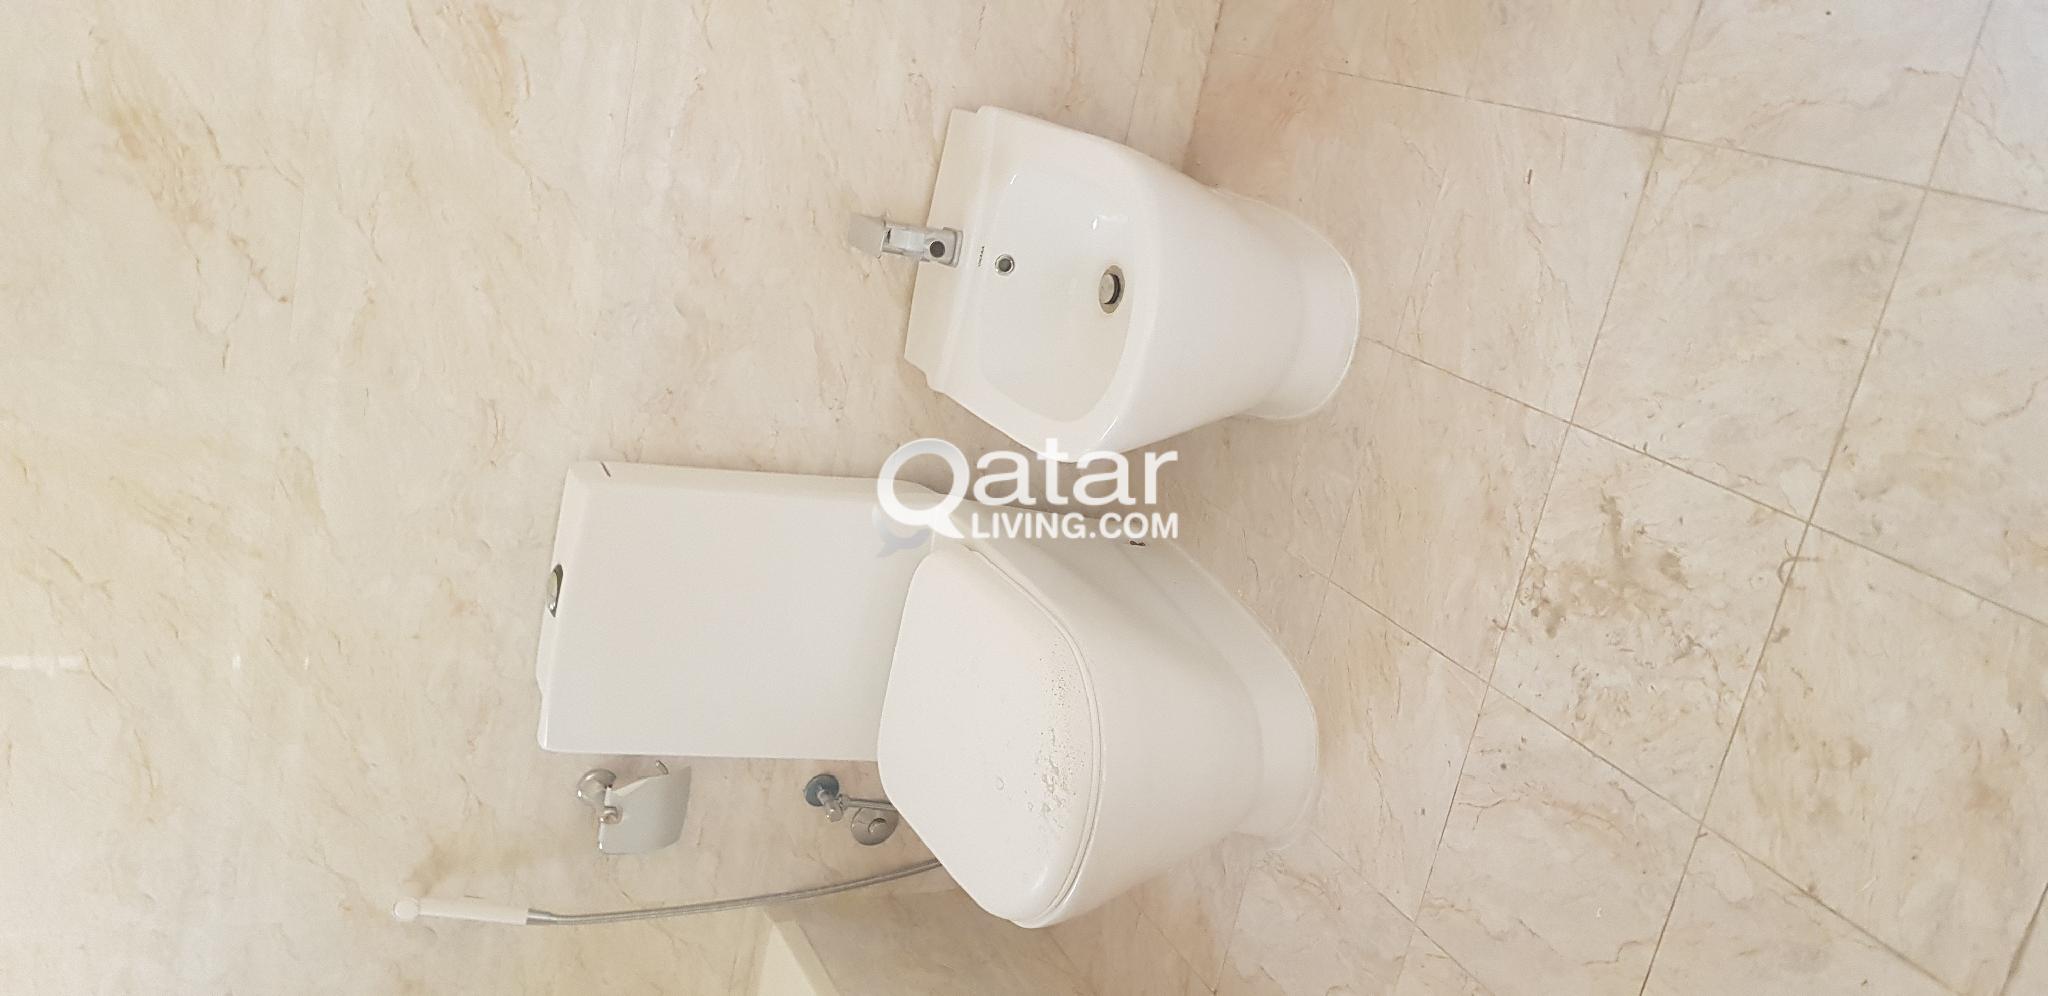 Bathroom sets for sale  Qatar Living